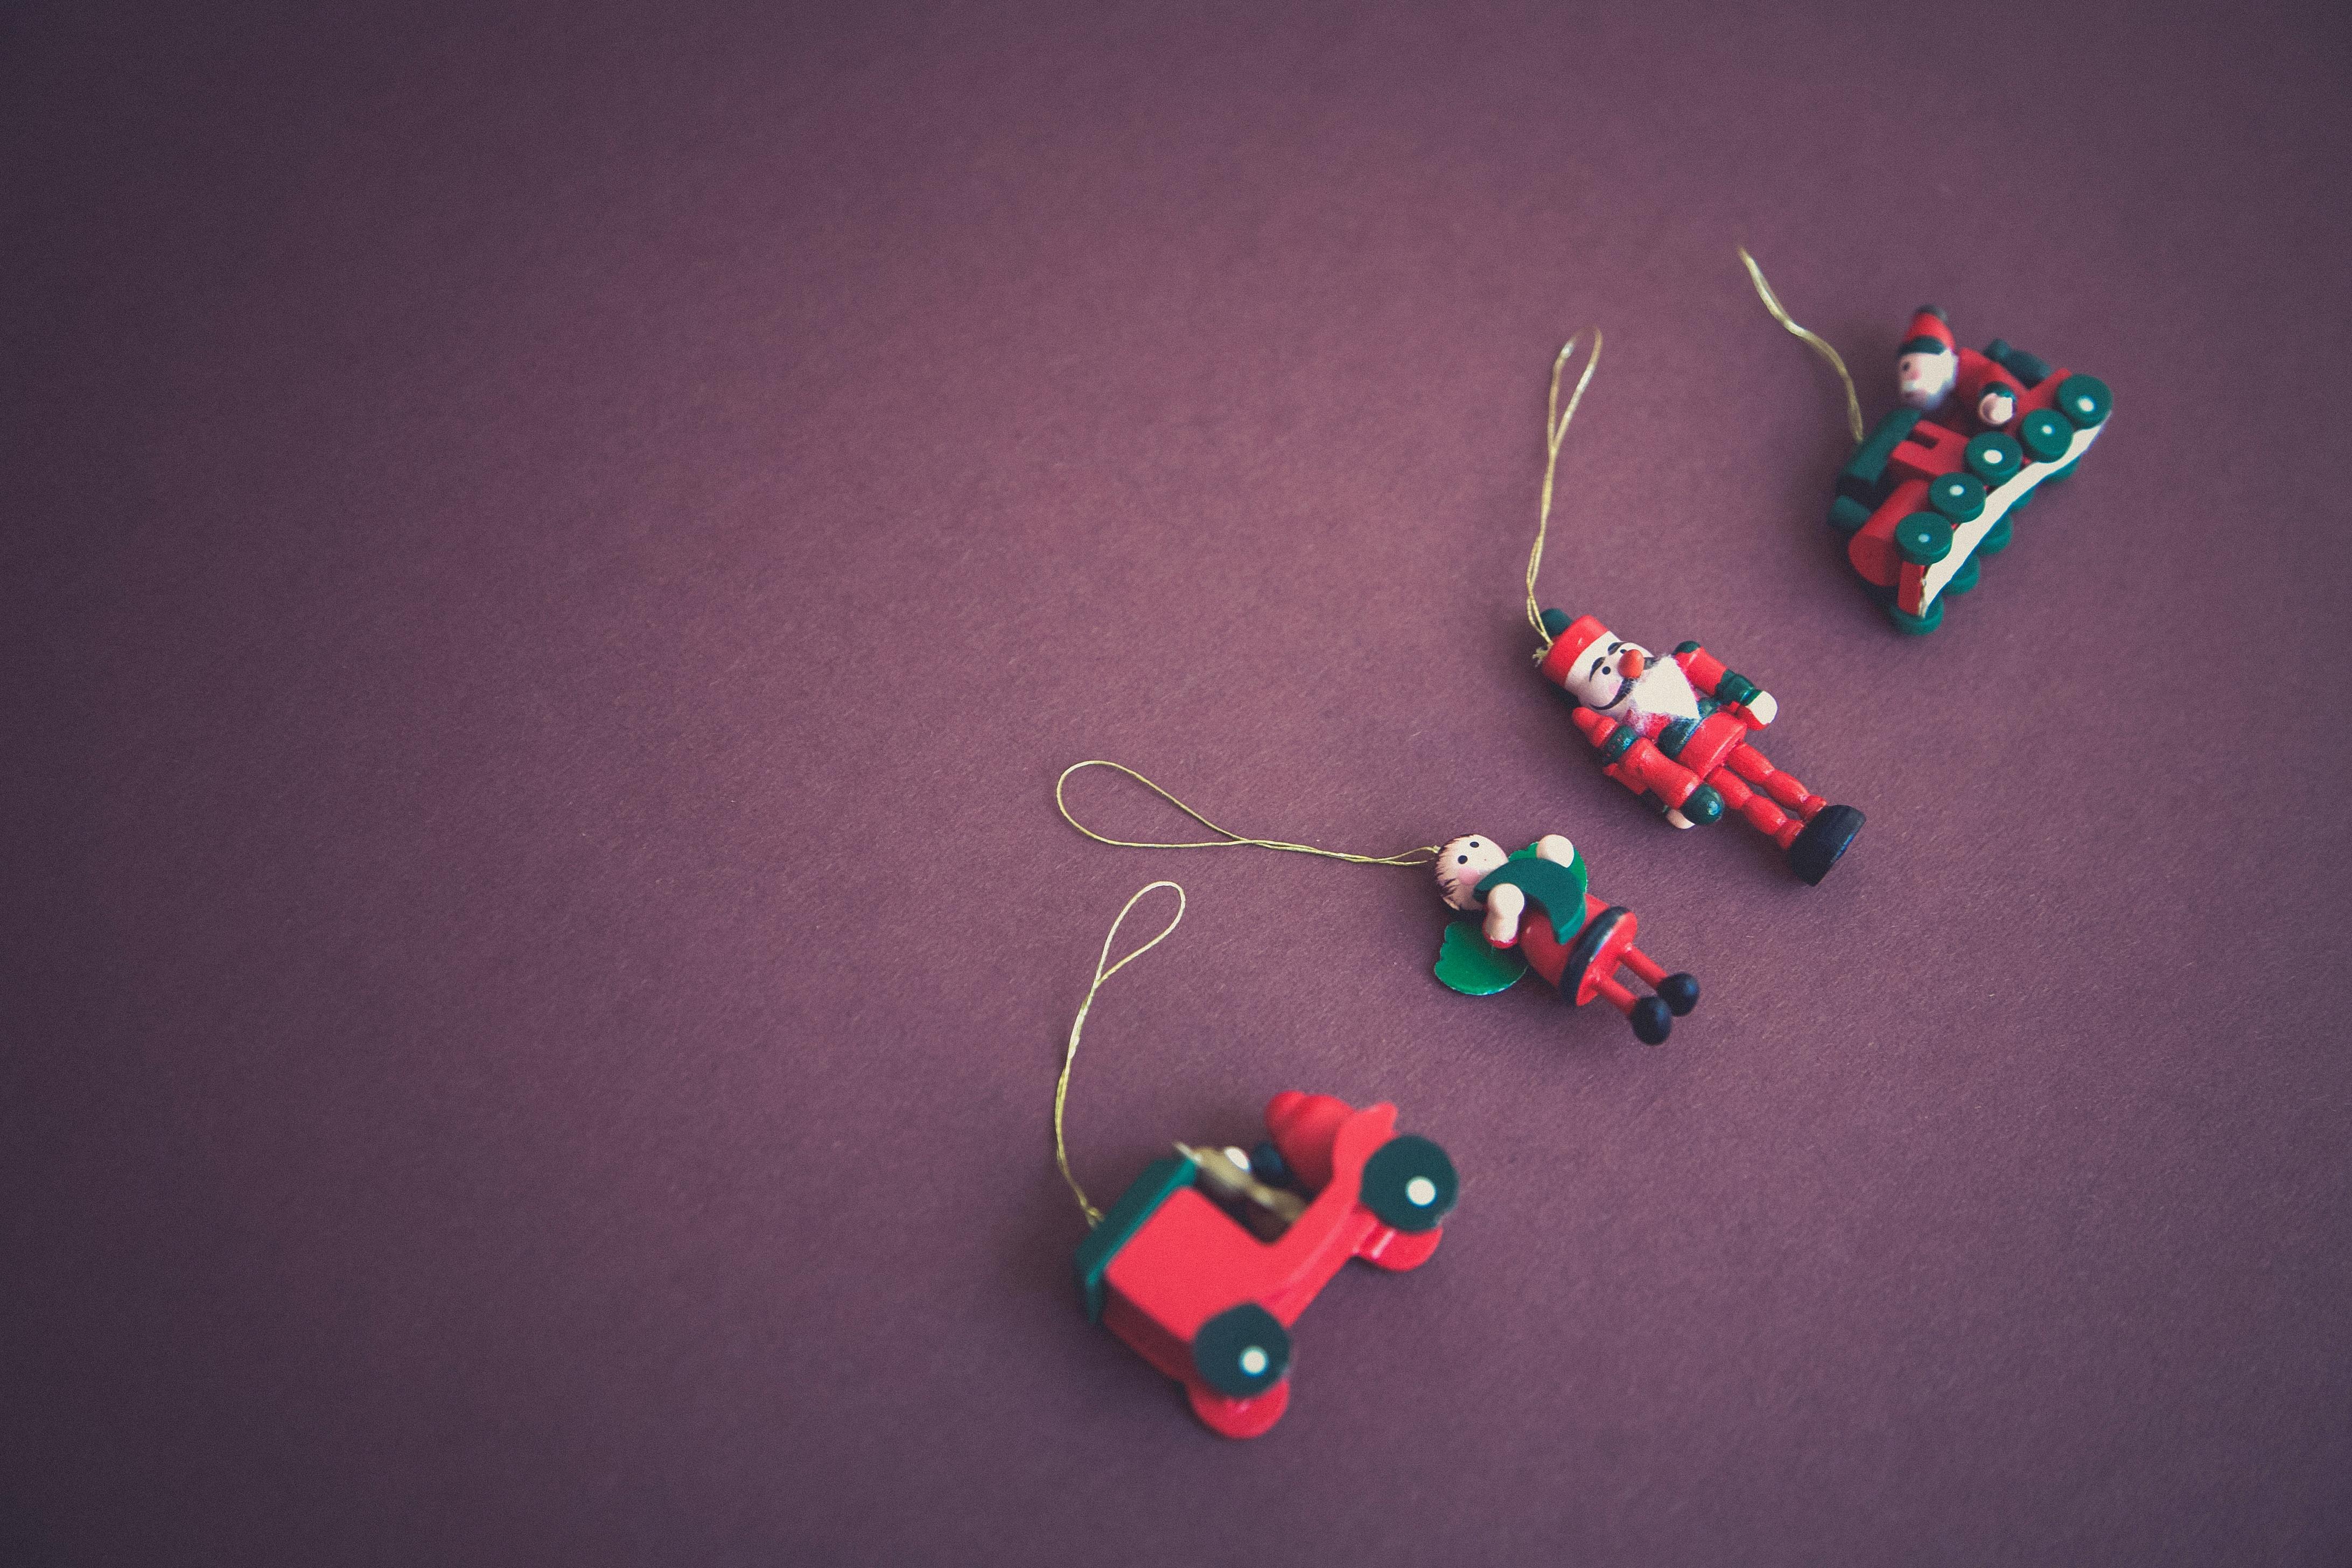 pexels-photo-santa-claus-ornament.jpeg